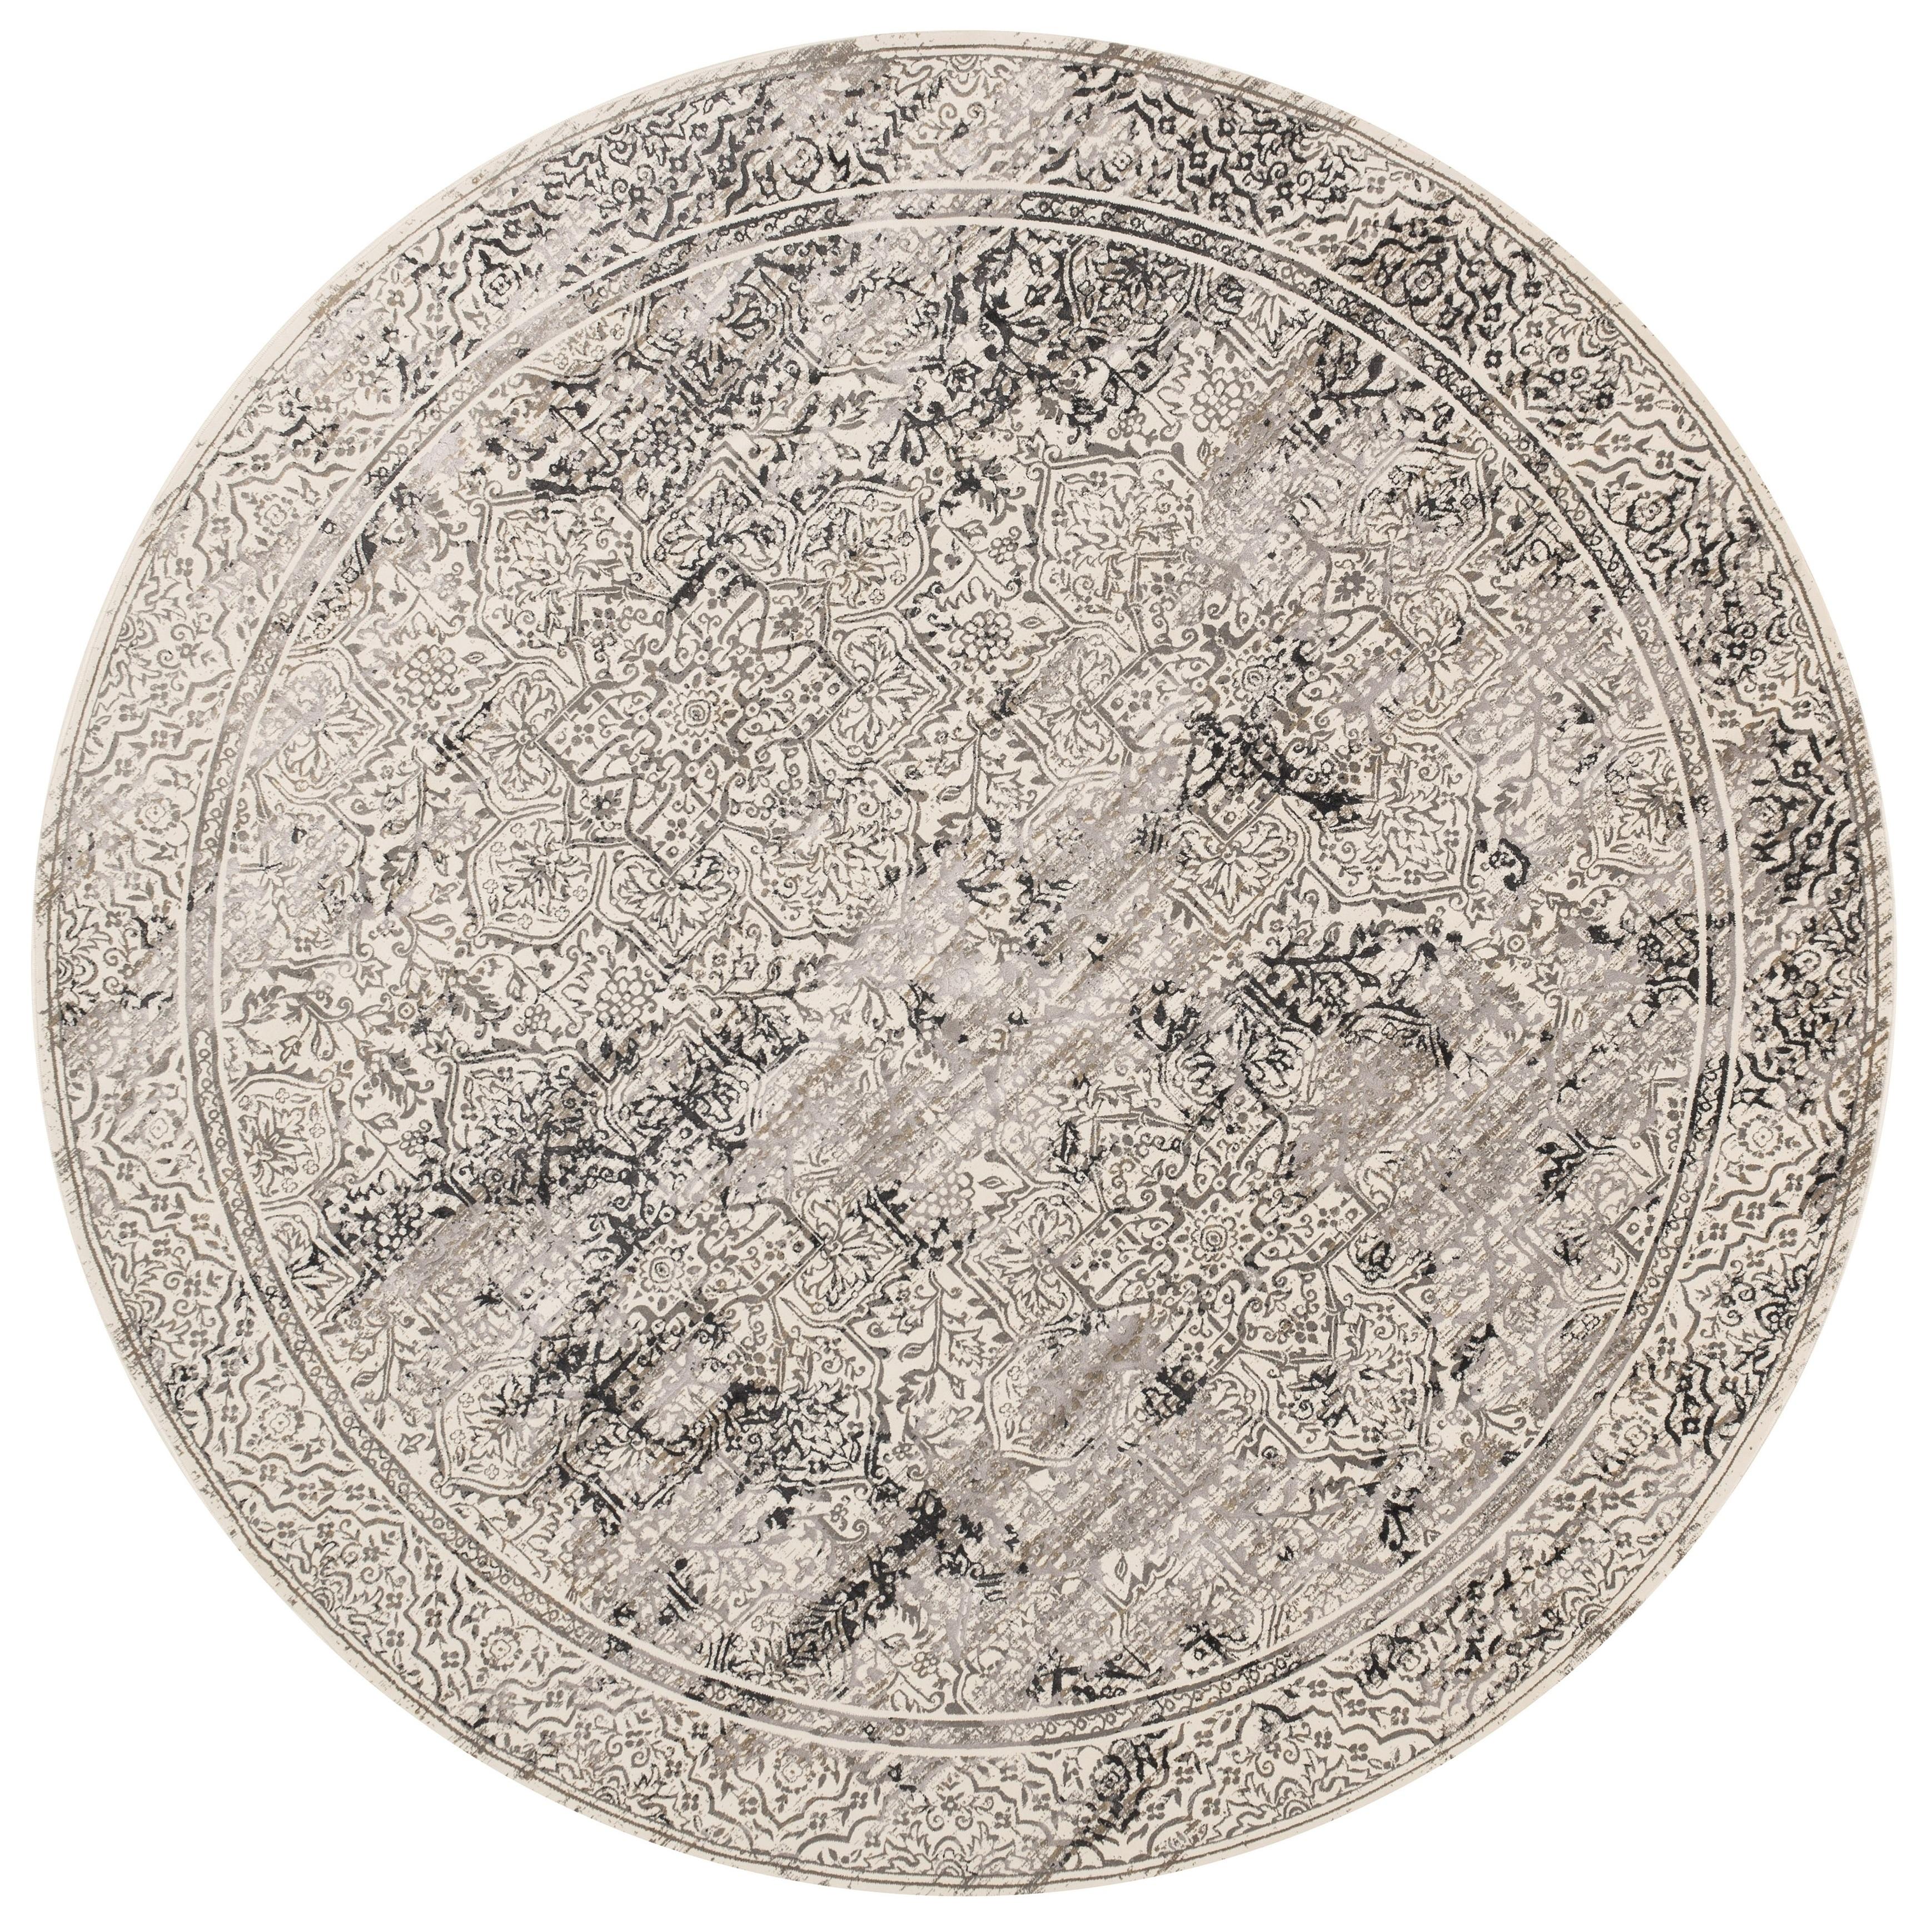 Distressed Vintage Inspired Grey Filigree Round Rug - 93 x 93 Round (Ivory/Grey - 93 x 93 Round)